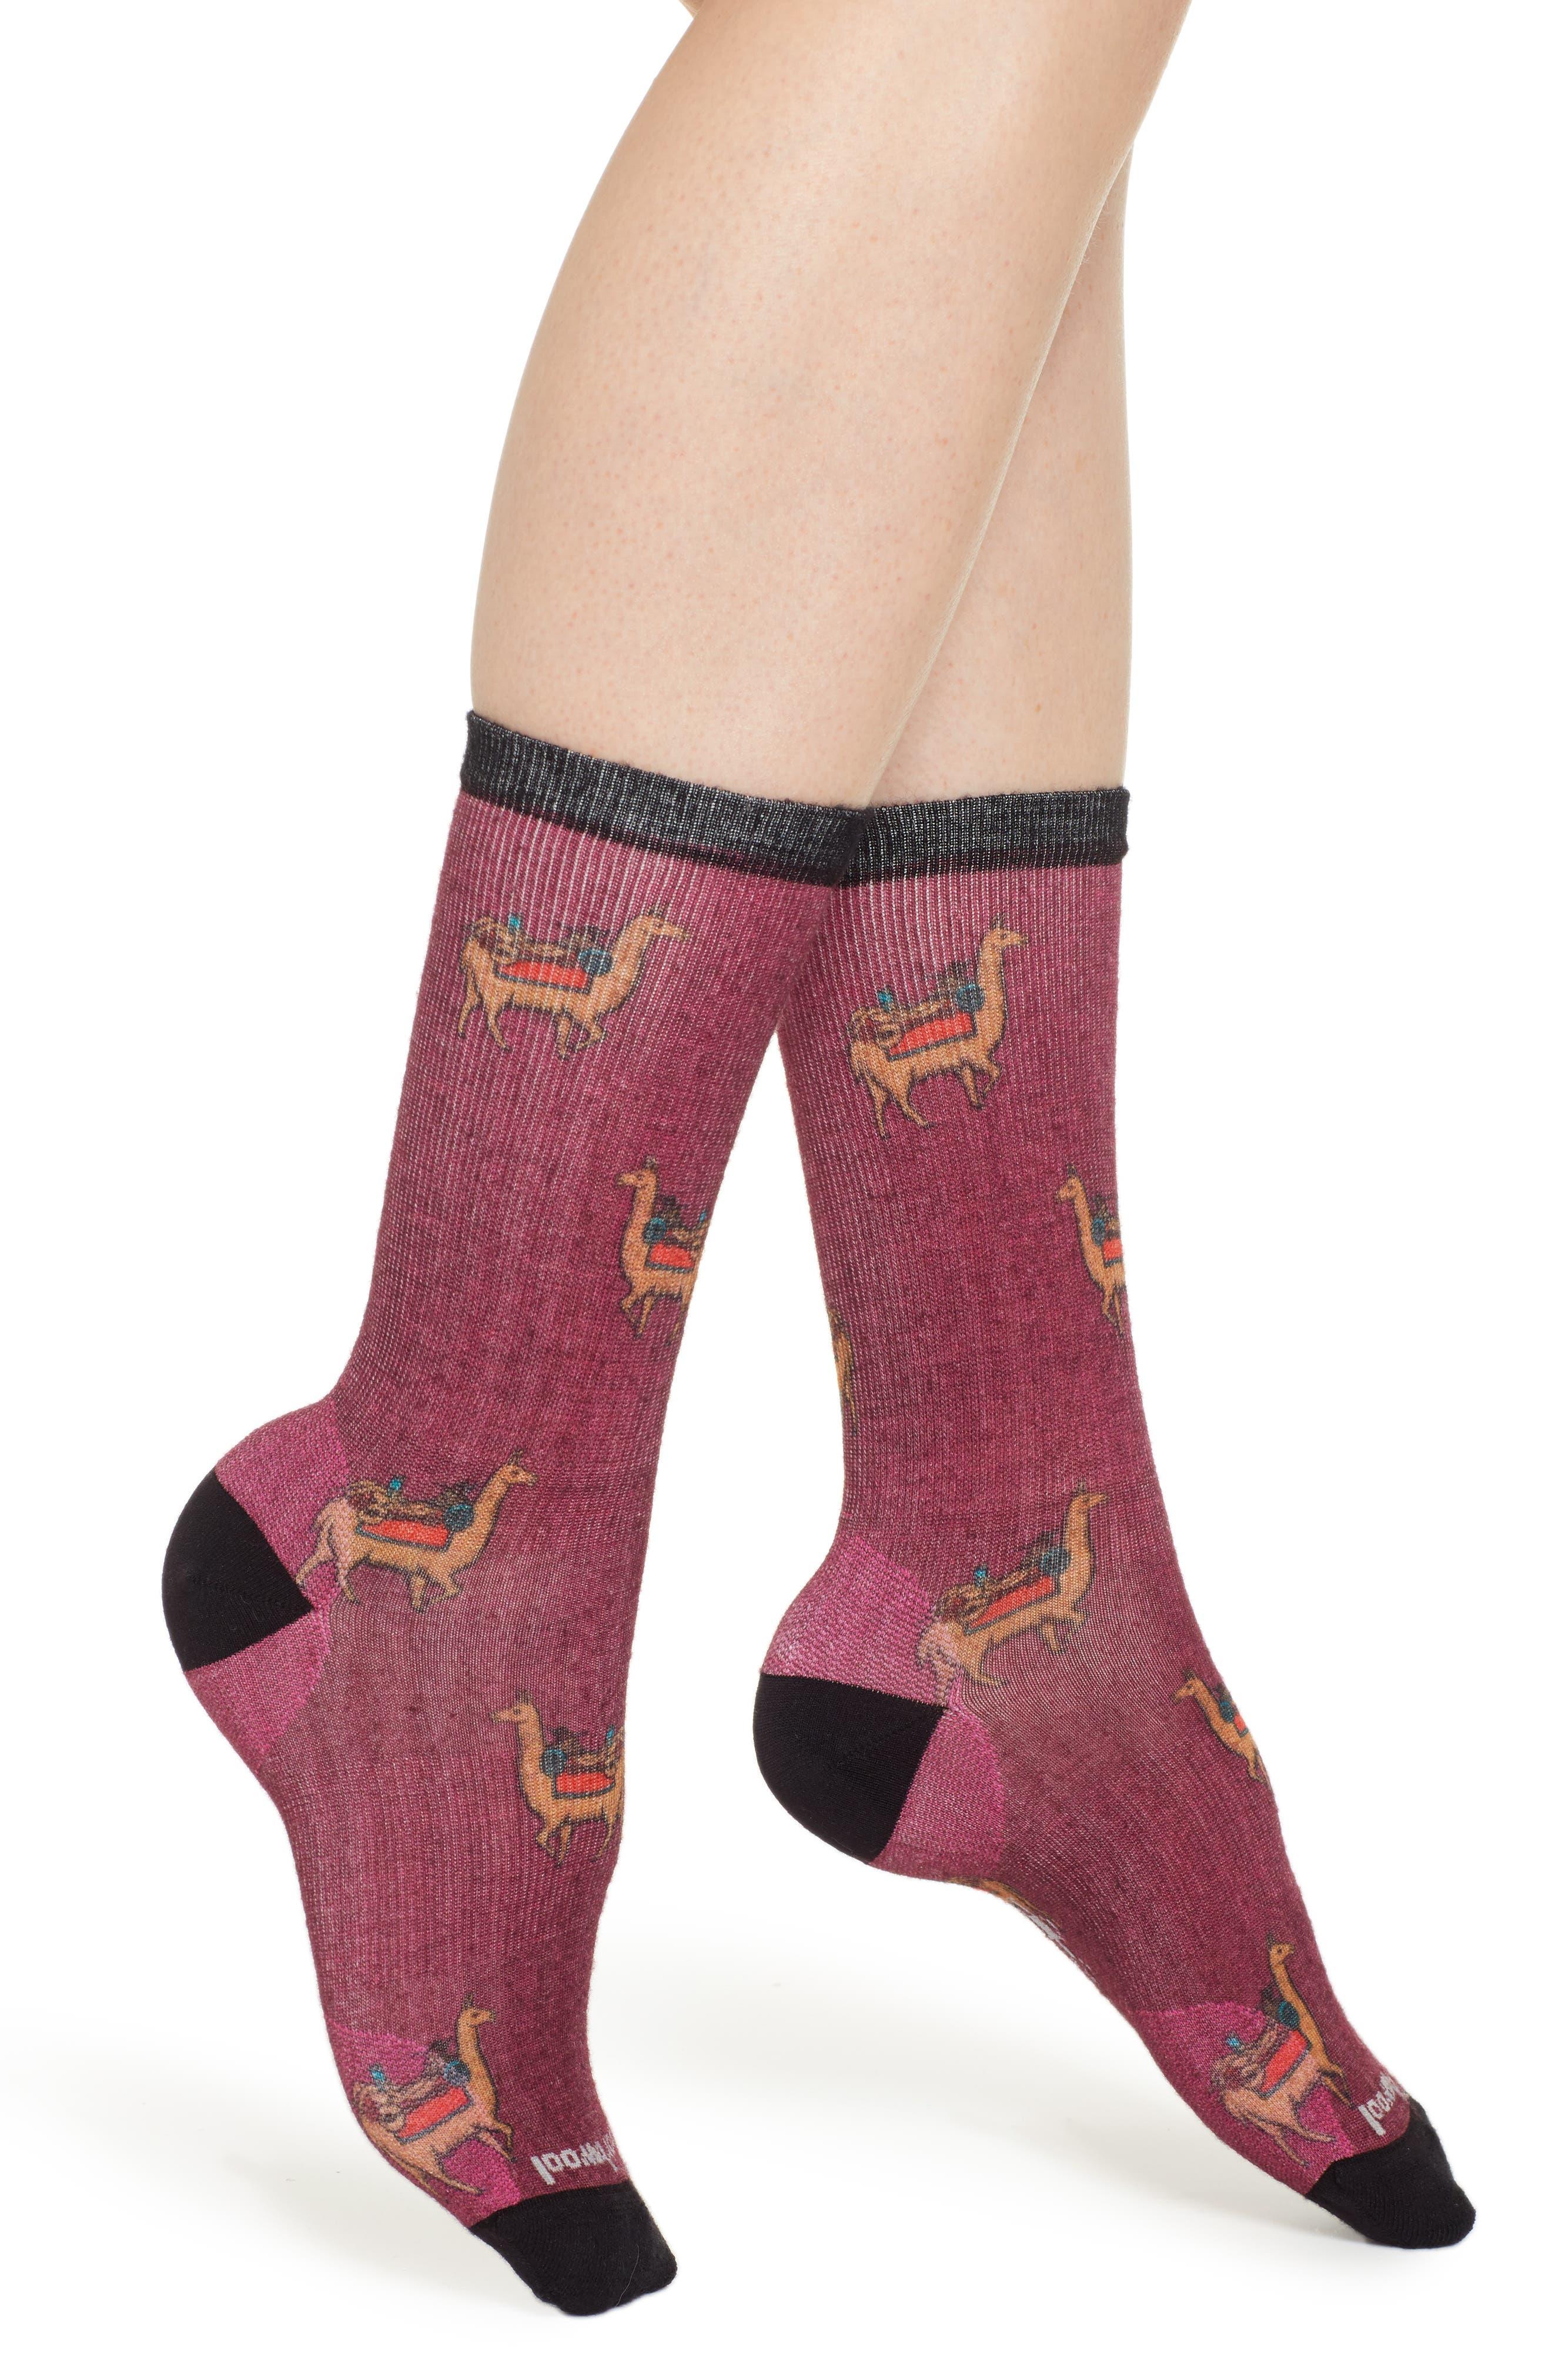 SMARTWOOL,                             Curated Llama Adventures Crew Socks,                             Main thumbnail 1, color,                             WHITE MULTI